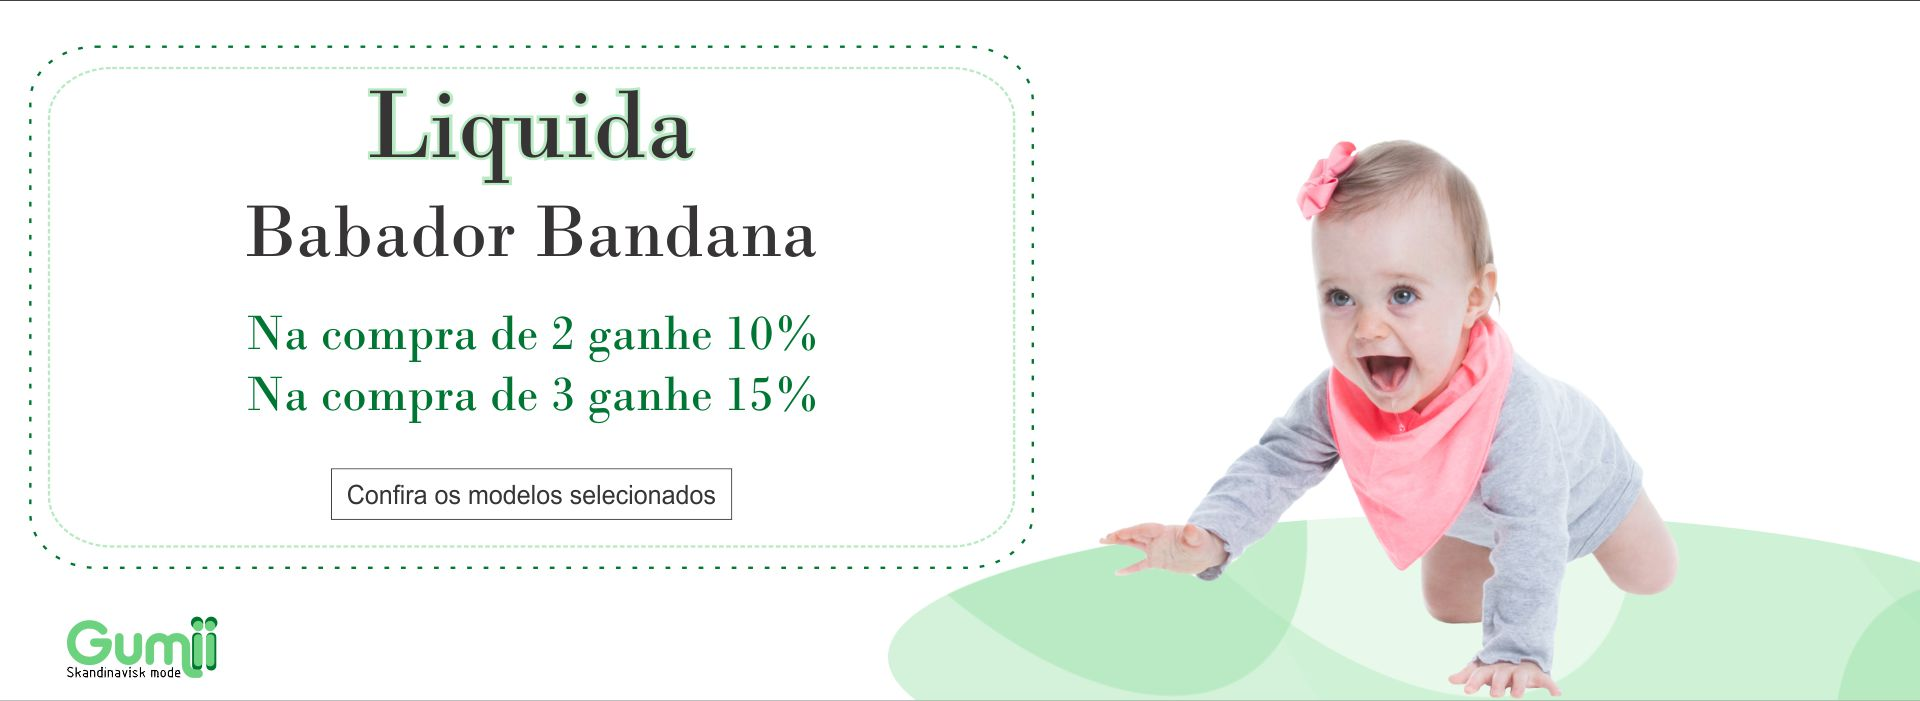 Liquida b.bandana